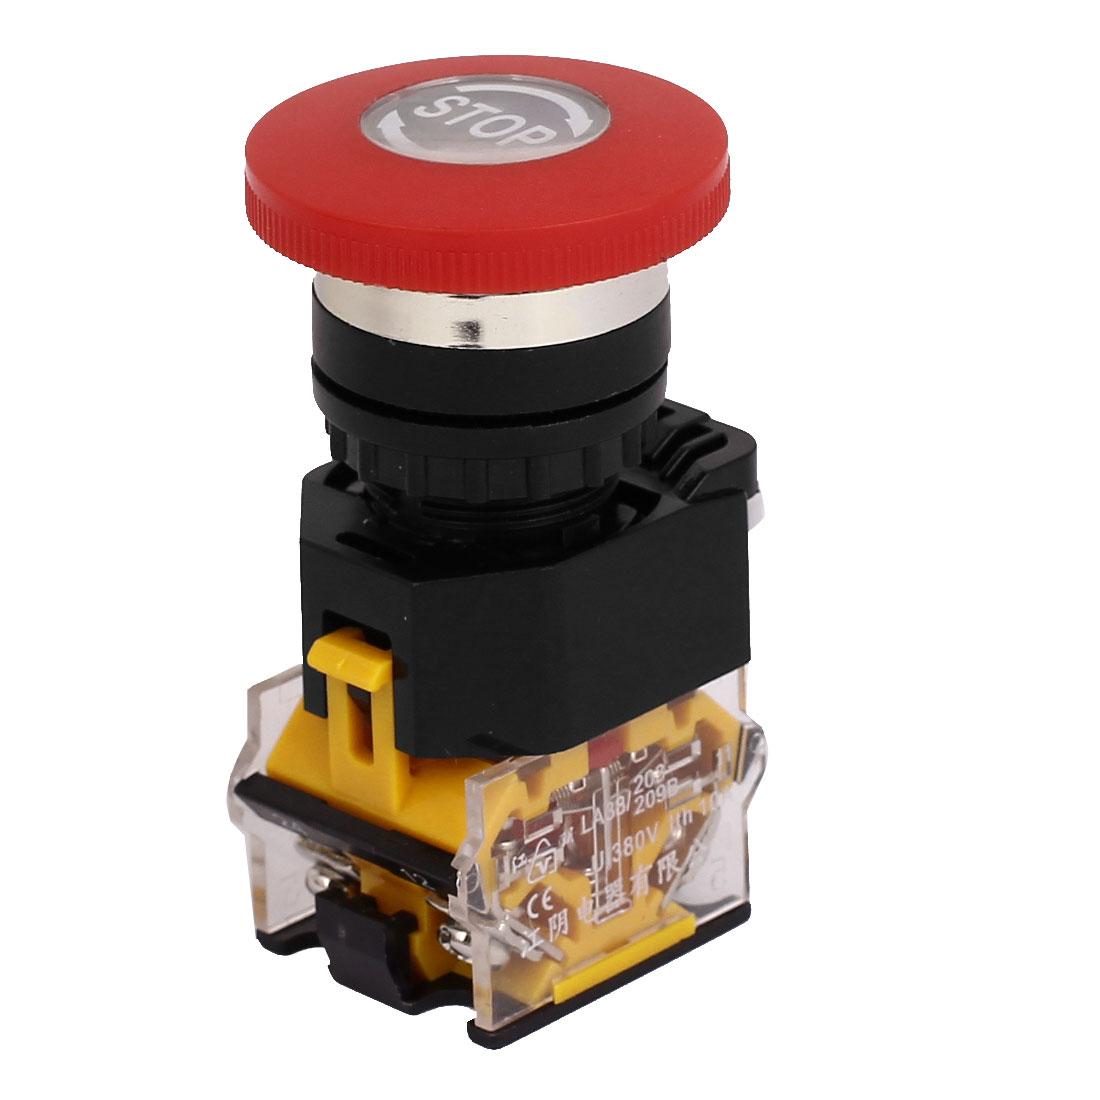 40mm Mushroom Cap 1NC 1NO Latching Emergency Stop Push Button Switch 380V 10A